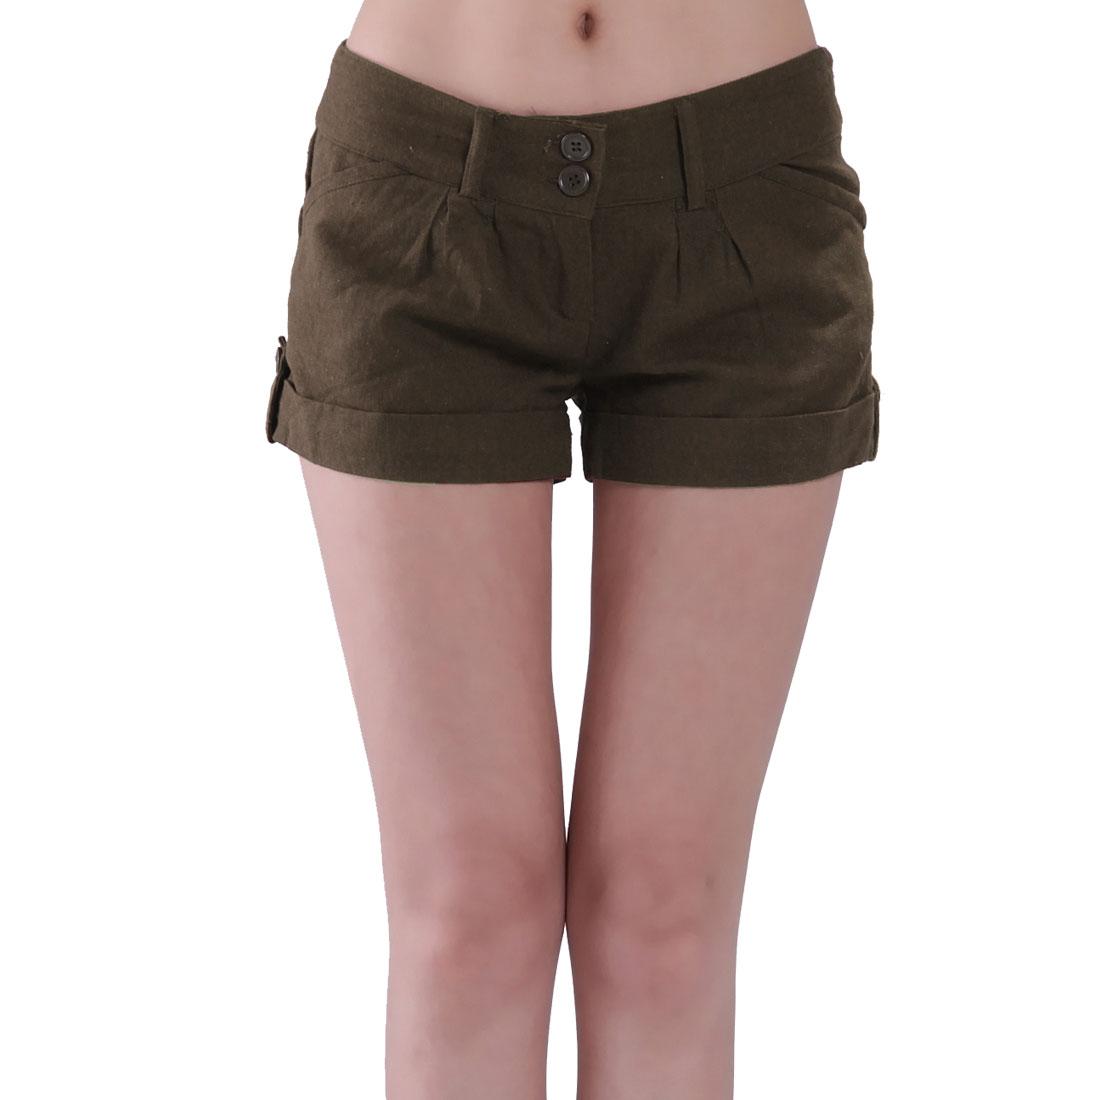 Casual Cuff Tabs Belt Loop Zip Shorts Trousers Brown S for Ladies